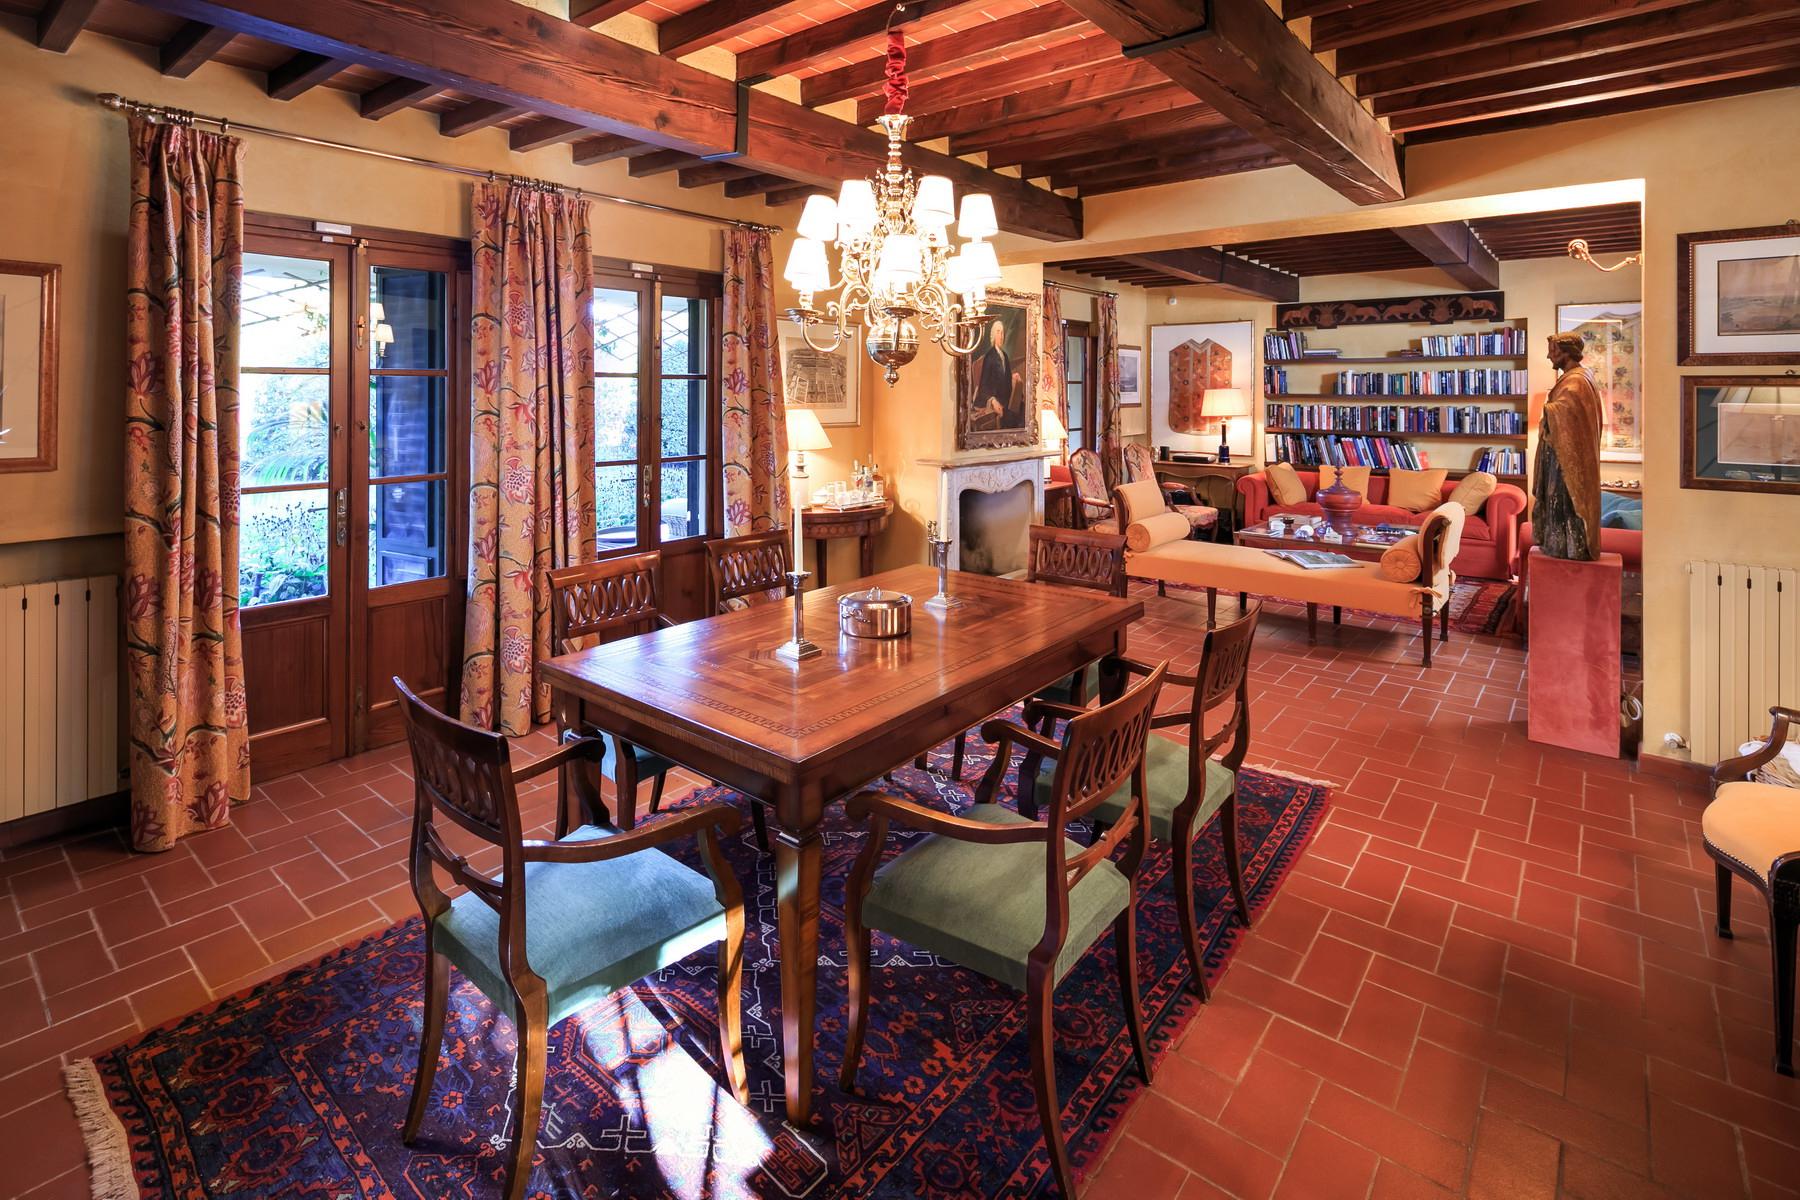 Villa in Vendita a Lucca: 5 locali, 900 mq - Foto 7